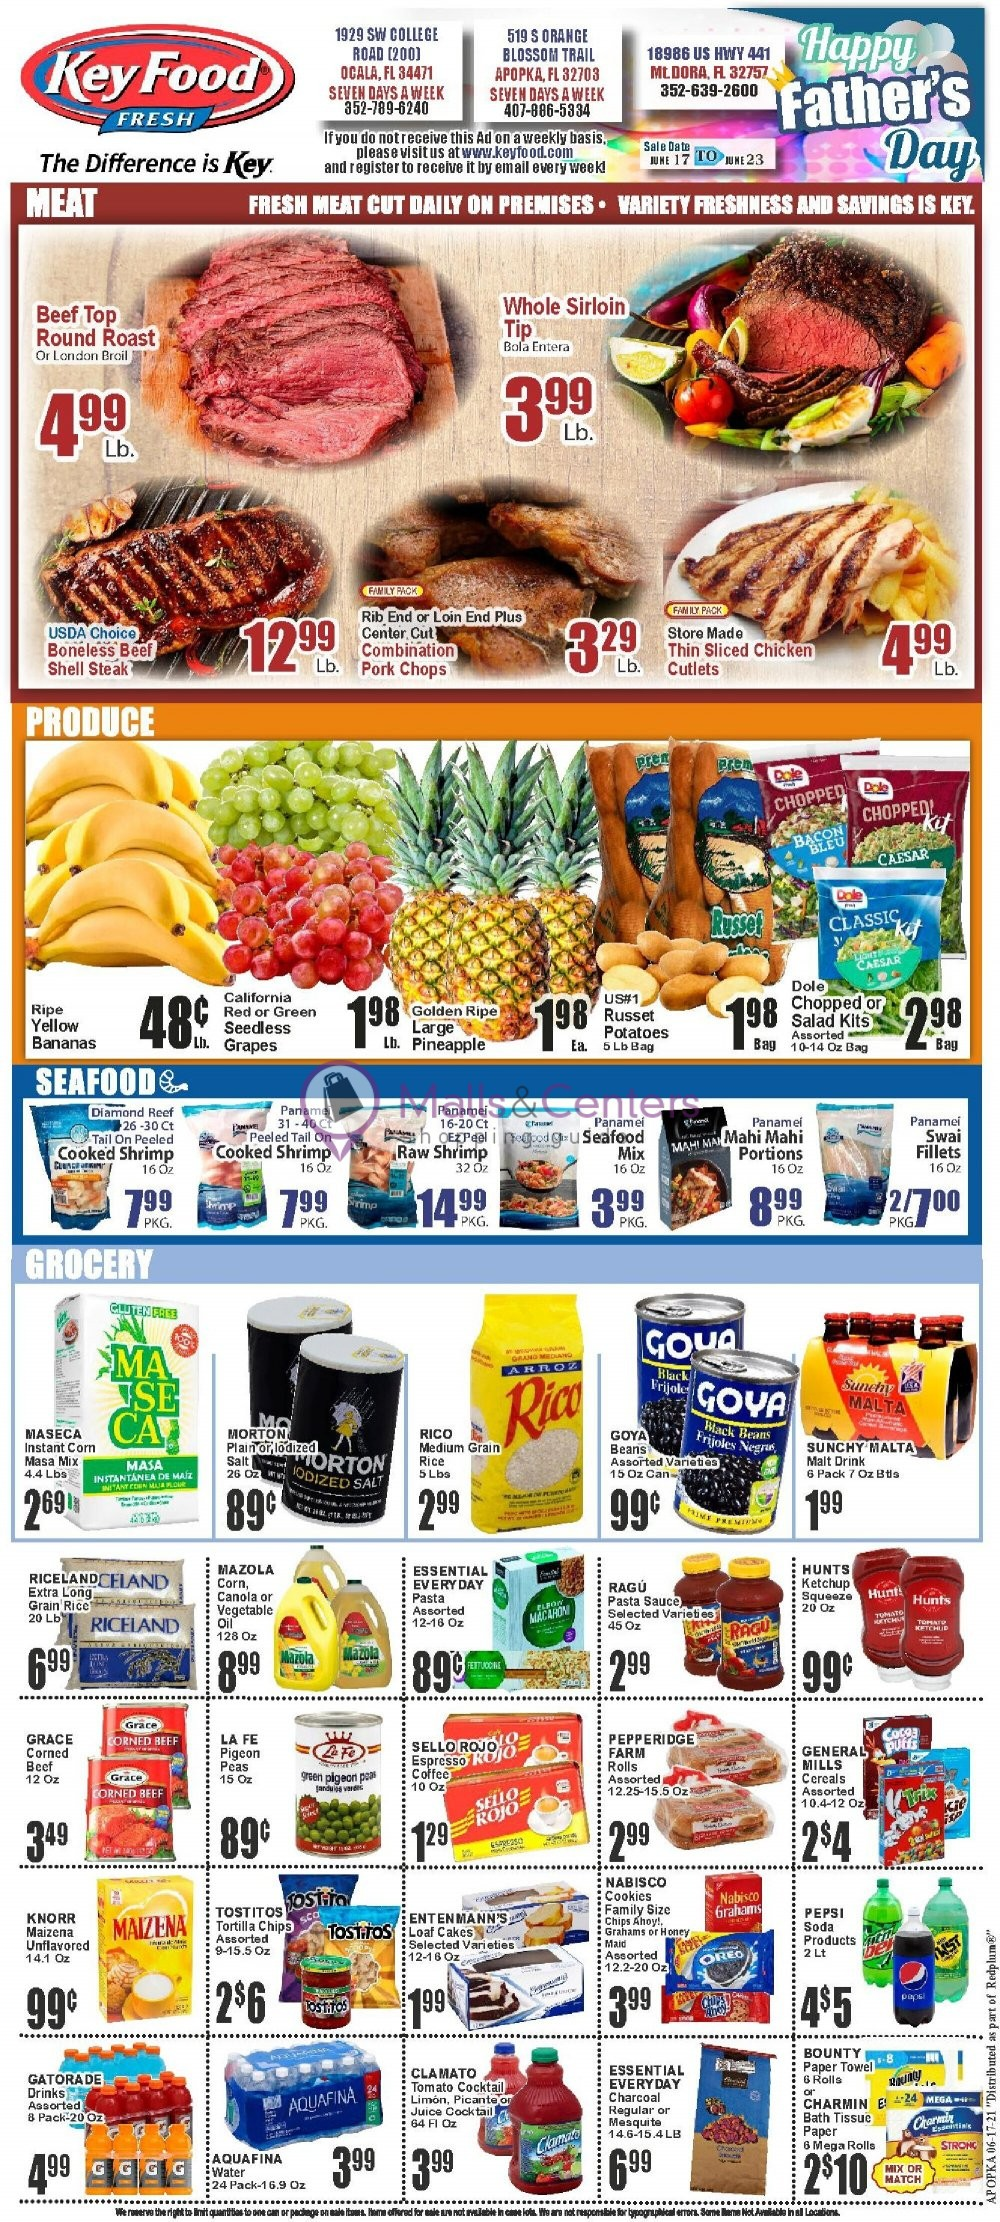 weekly ads El Rey Foods - page 1 - mallscenters.com